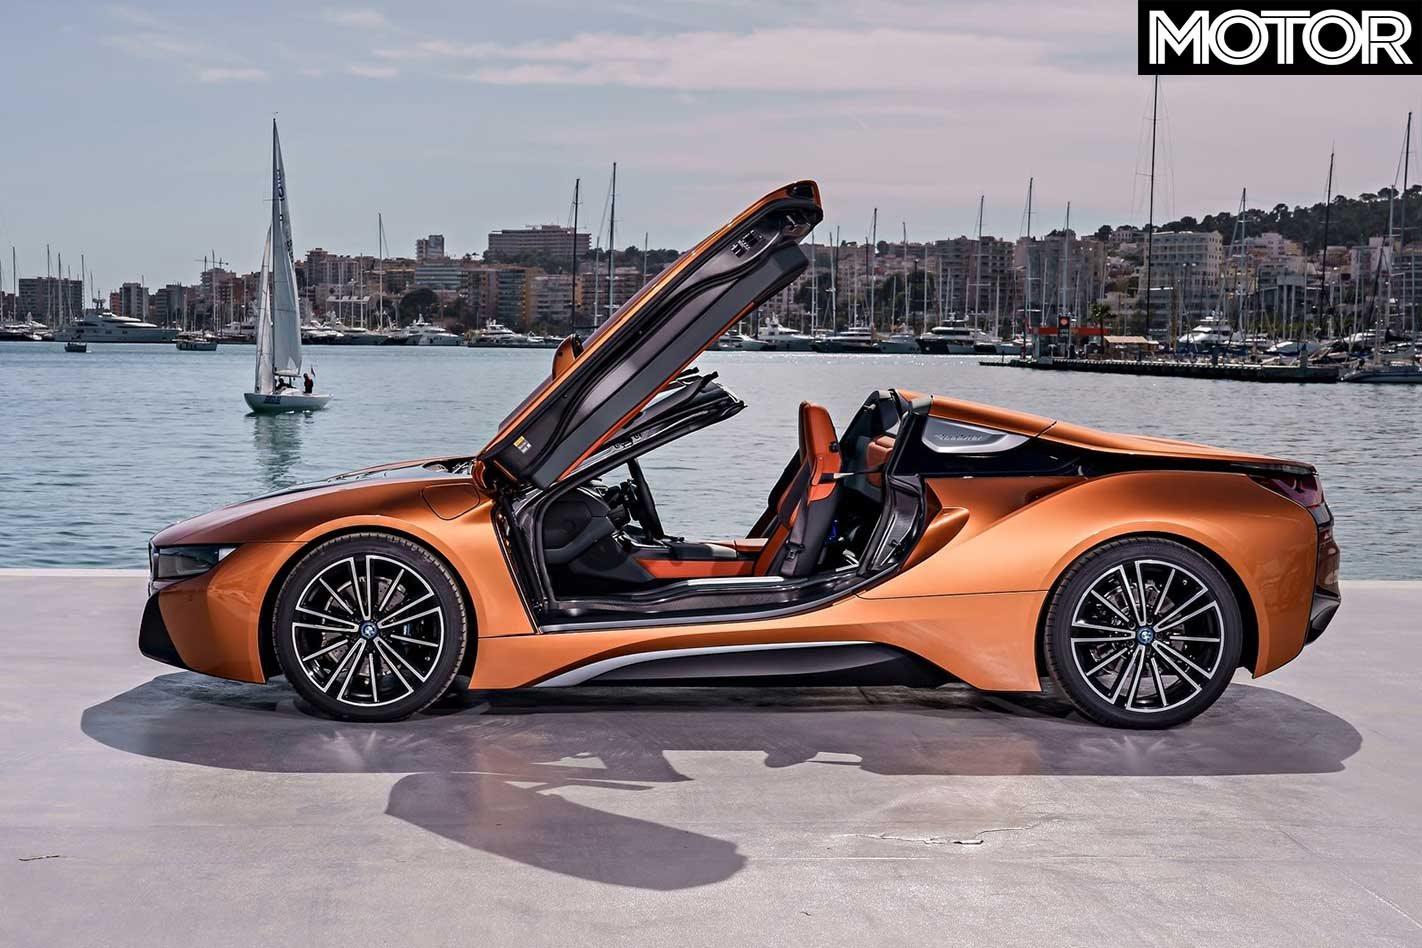 Innenraum leder spheric perforiert amido, bmw i interieurdesign carpo. Bmw I8 Price Bmw Cars